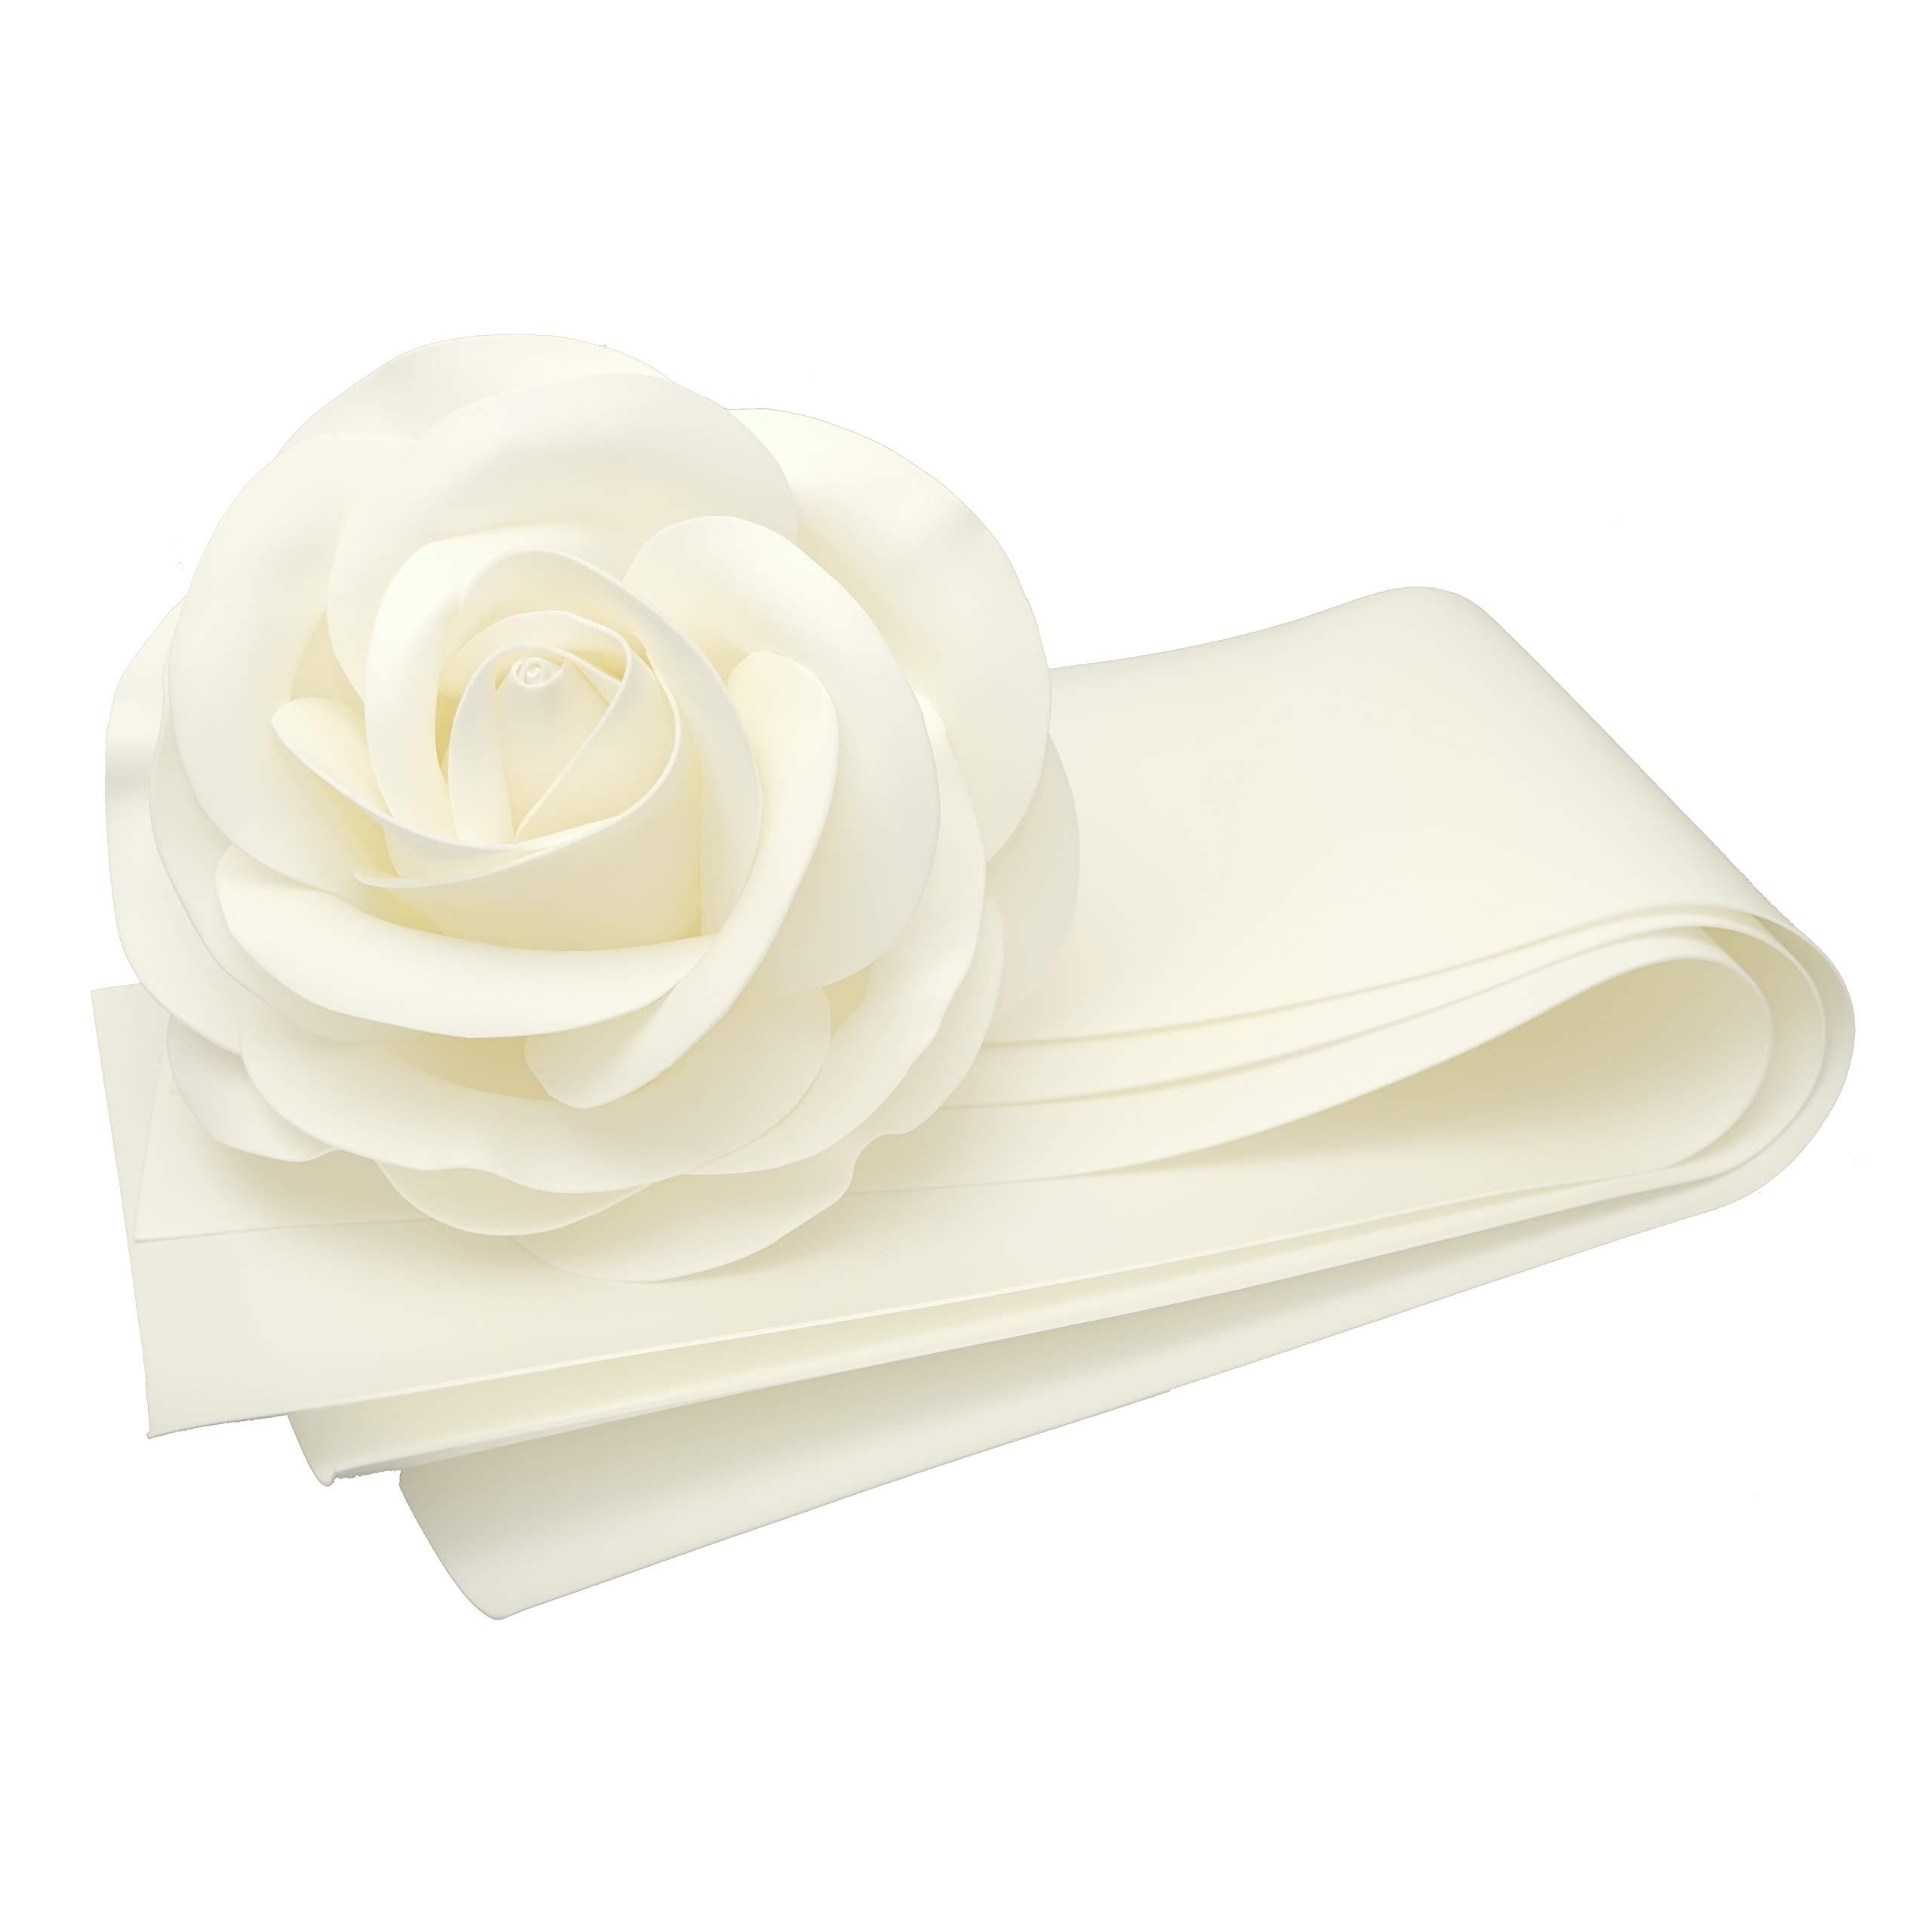 Craft Foam, 3 Strips 14'' x 39'' (36 cm x 100 cm), Thickness 0.078'' (2 mm) (White Cream)